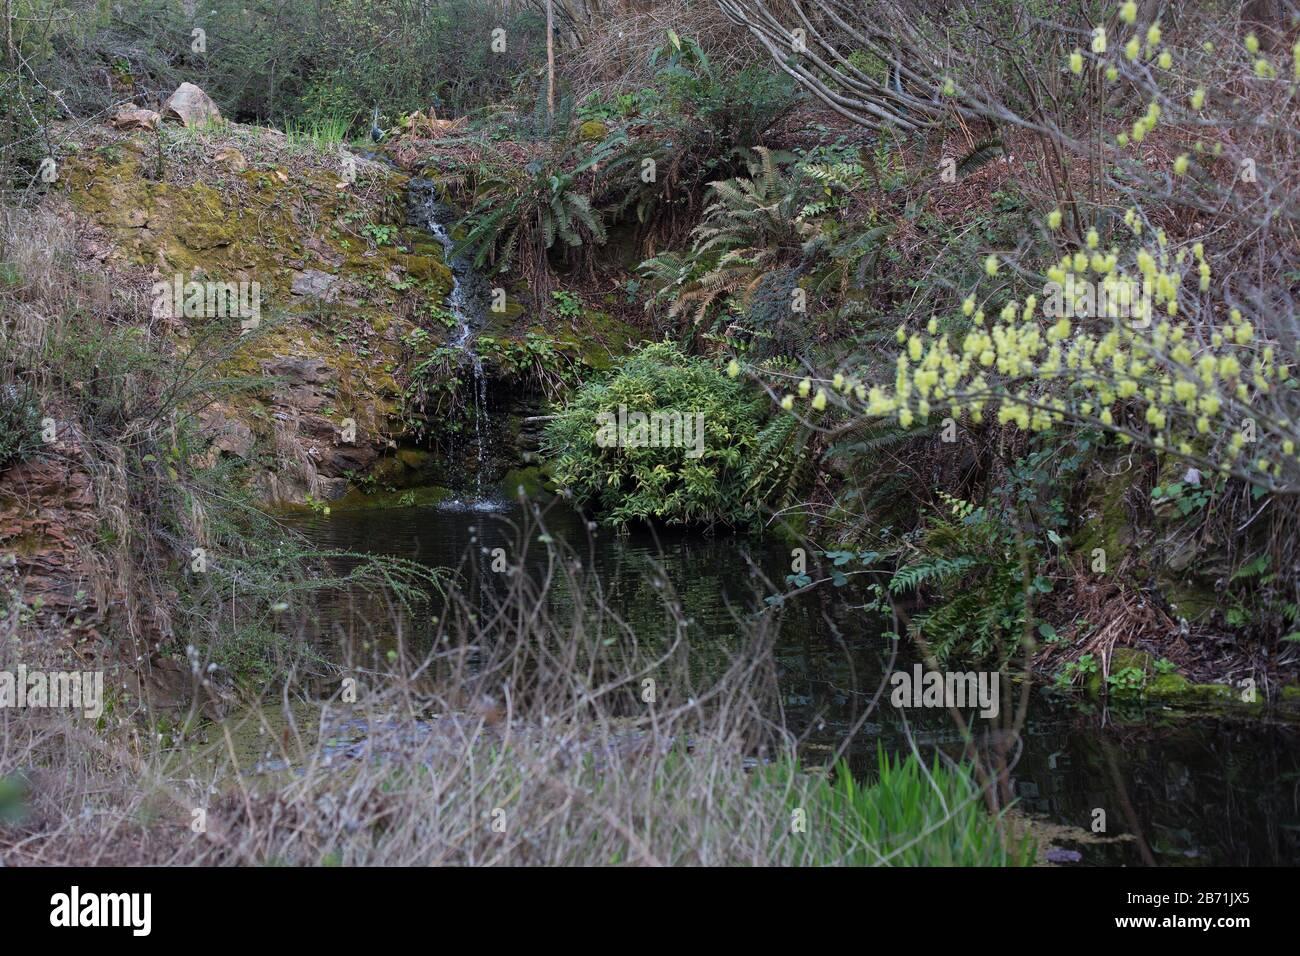 A Waterfall Running Through Quarryhill Botanical Garden In Glen Ellen California Usa Stock Photo Alamy